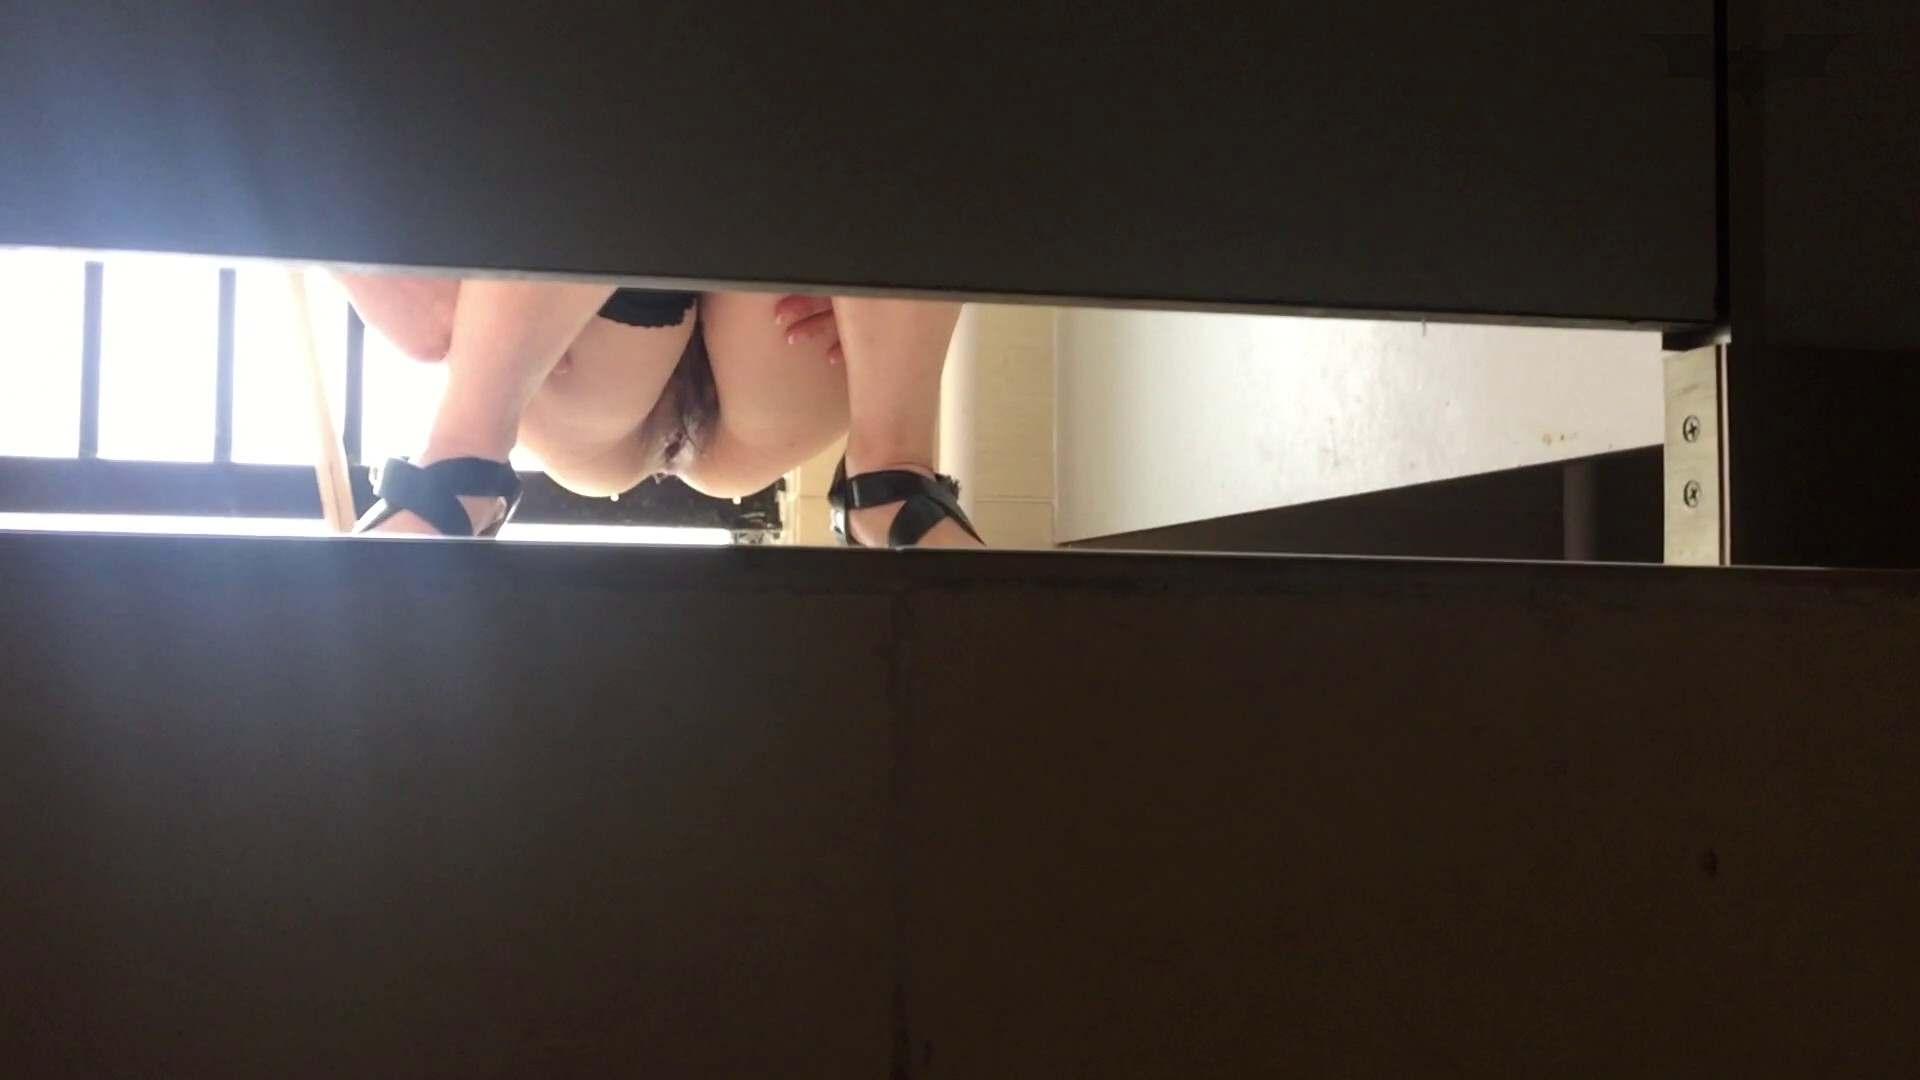 JD盗撮 美女の洗面所の秘密 Vol.73 美女 盗撮セックス無修正動画無料 57pic 28